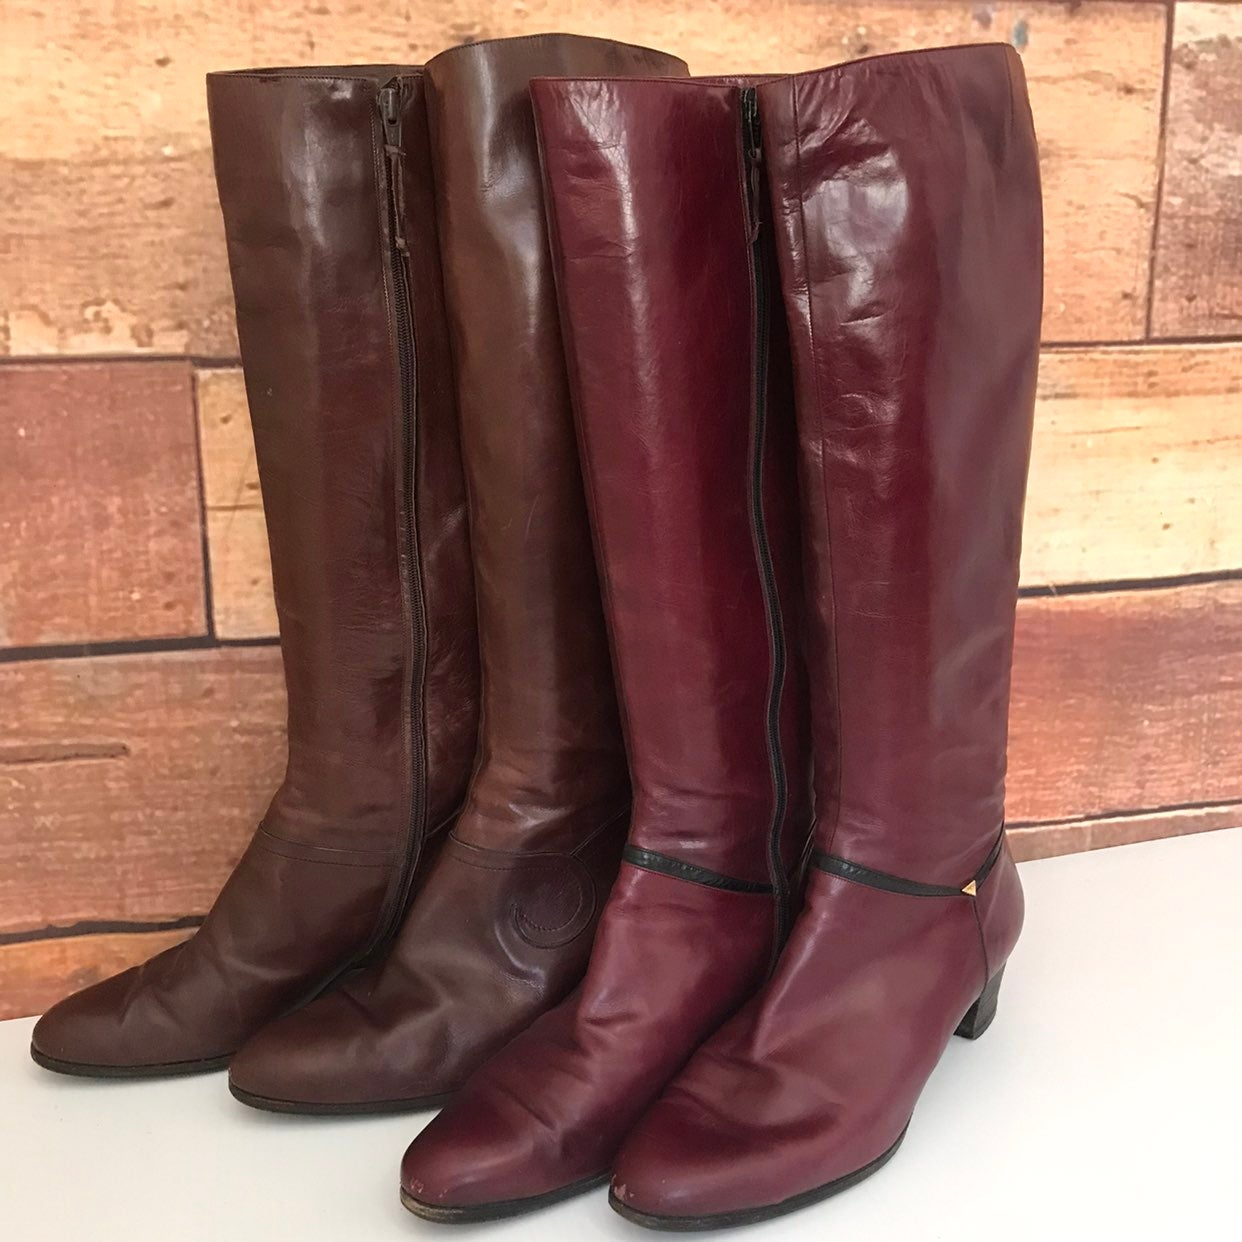 Vintage Salvatore Ferragamo Boots Sz10.5